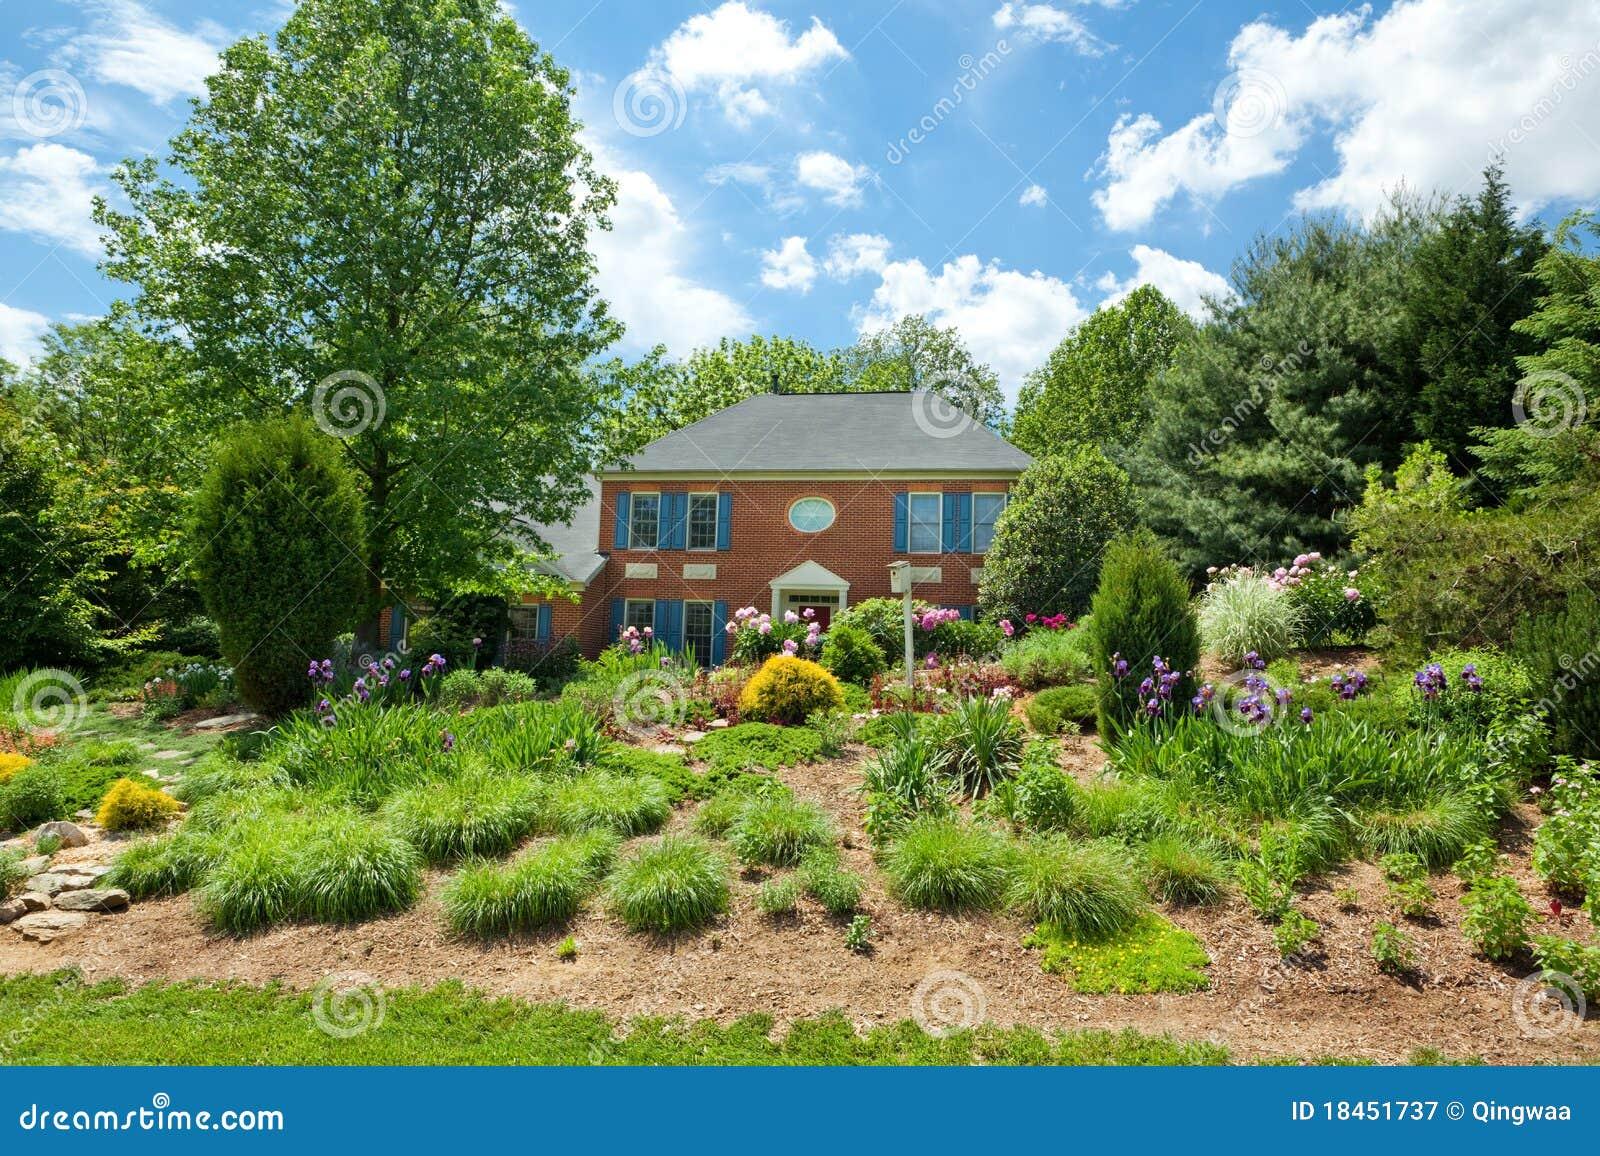 Single House Home Flower Landscaped Garden